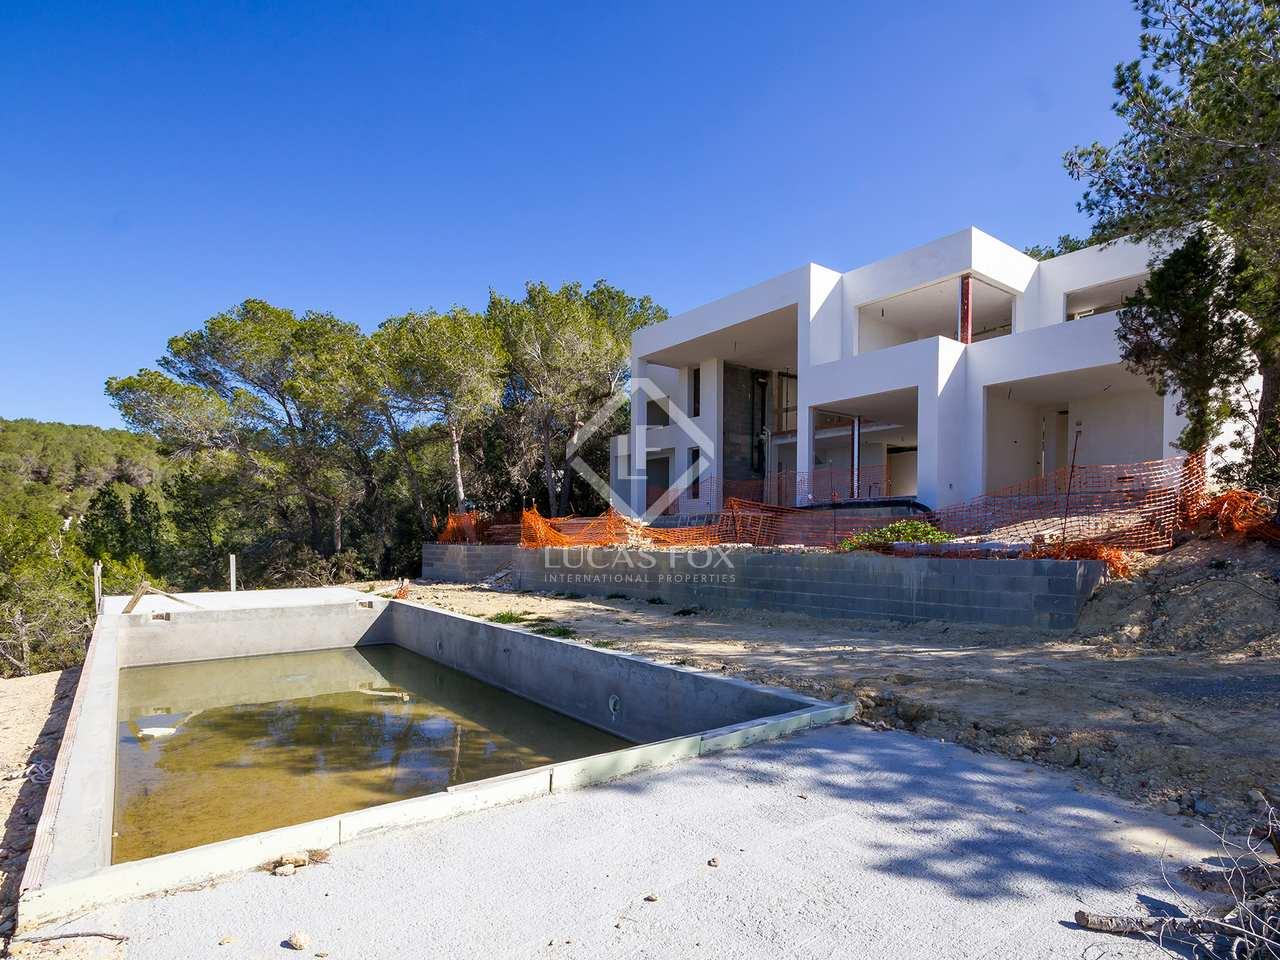 Projet de construction neuf en vente cala salada ibiza for Vente projet de construction